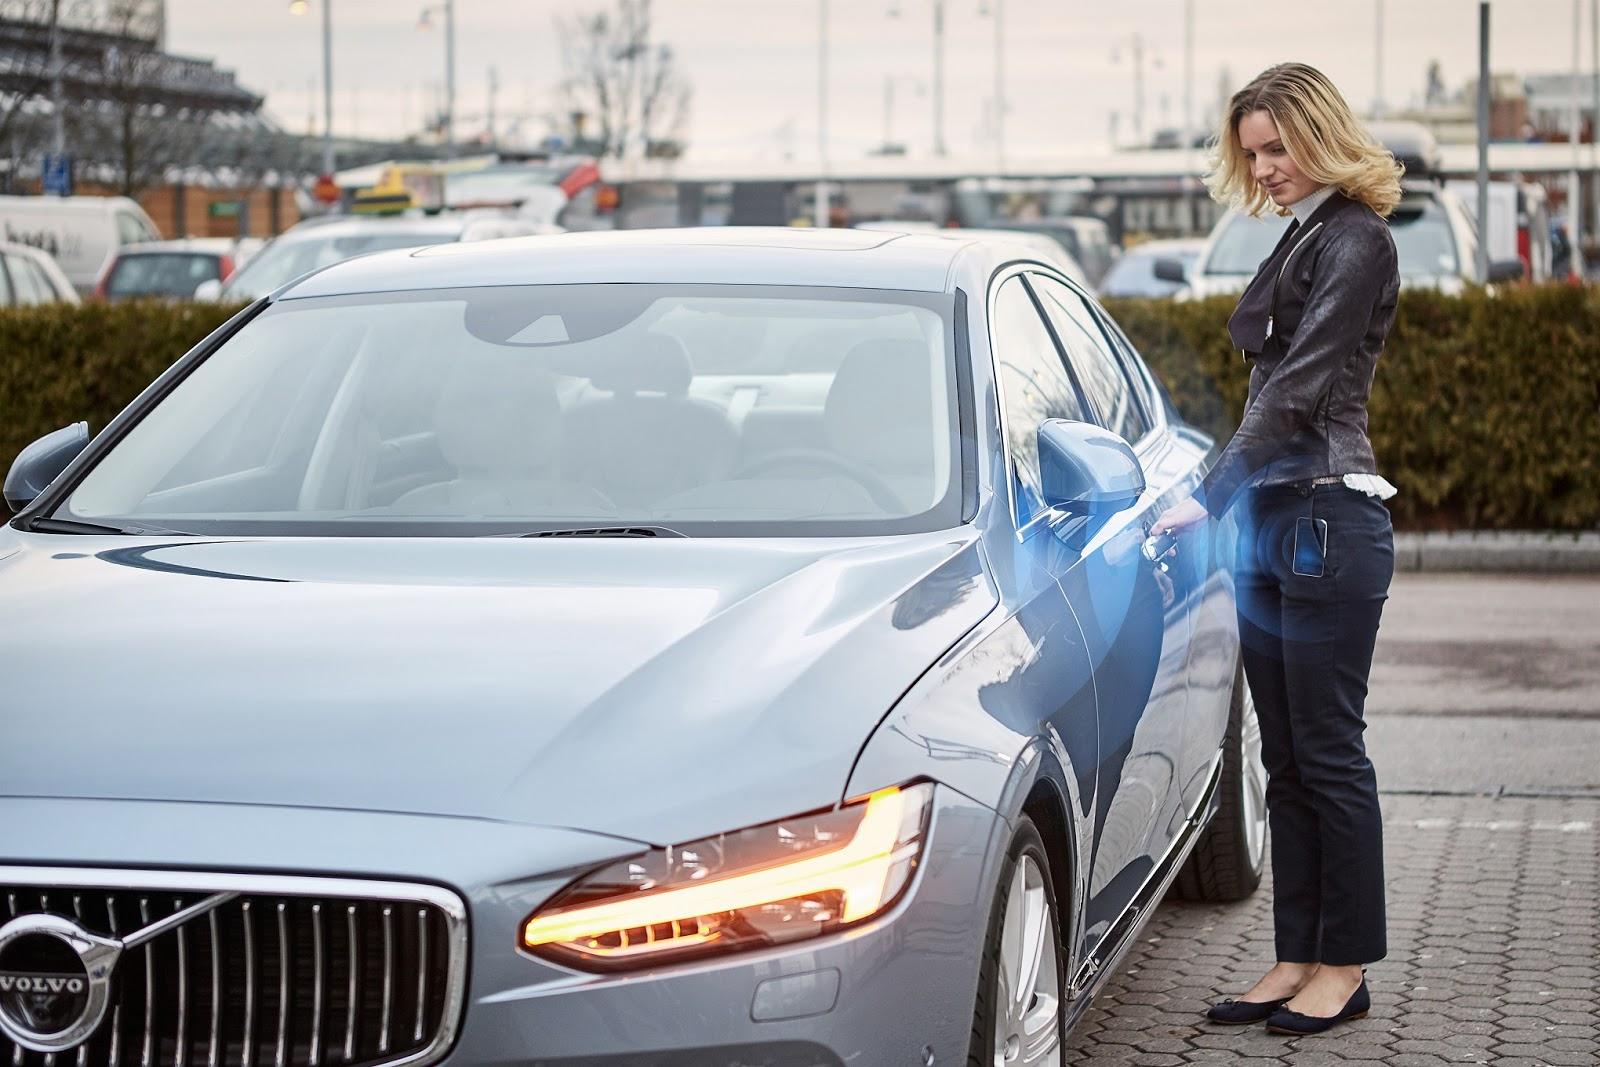 VOLVO%2BDIGITAL%2BCAR%2BKEY%2B3 Απο το 2017 η Volvo θα αντικαταστήσει το κλειδί με μια εφαρμογή στο κινητό